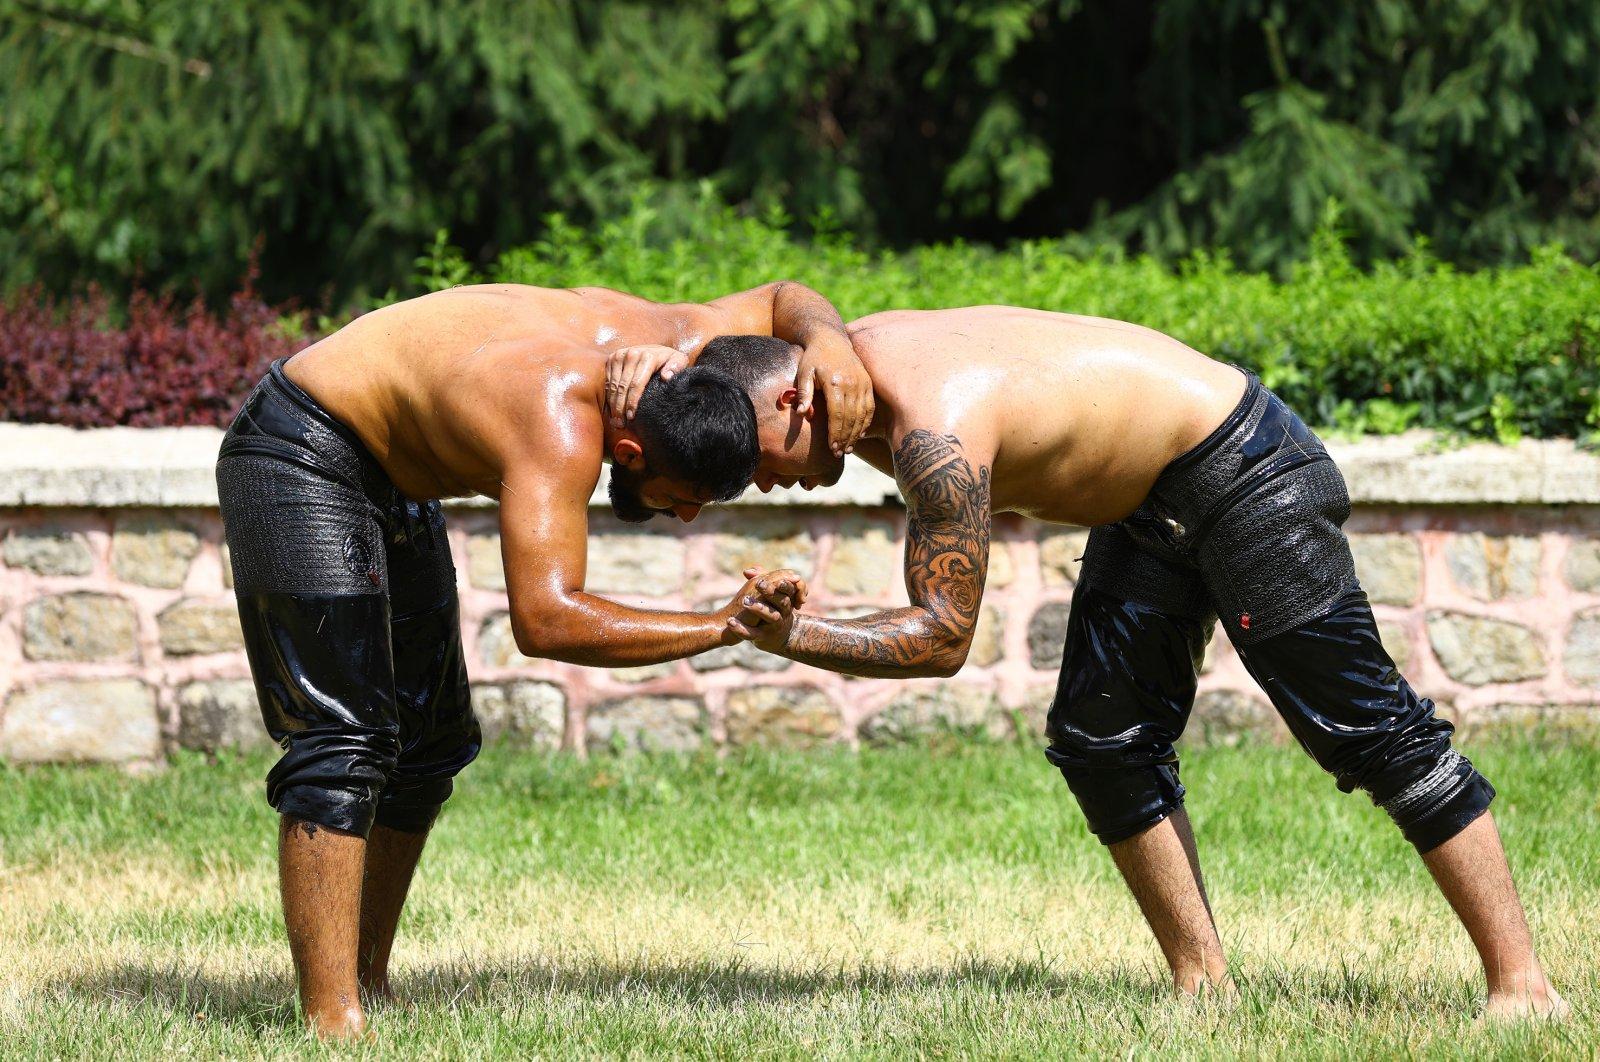 Wrestlers prepare to compete in the 660th Kırkpınar Oil Wrestling Festival, Edirne, Turkey, July 8, 2021. (AA Photo)